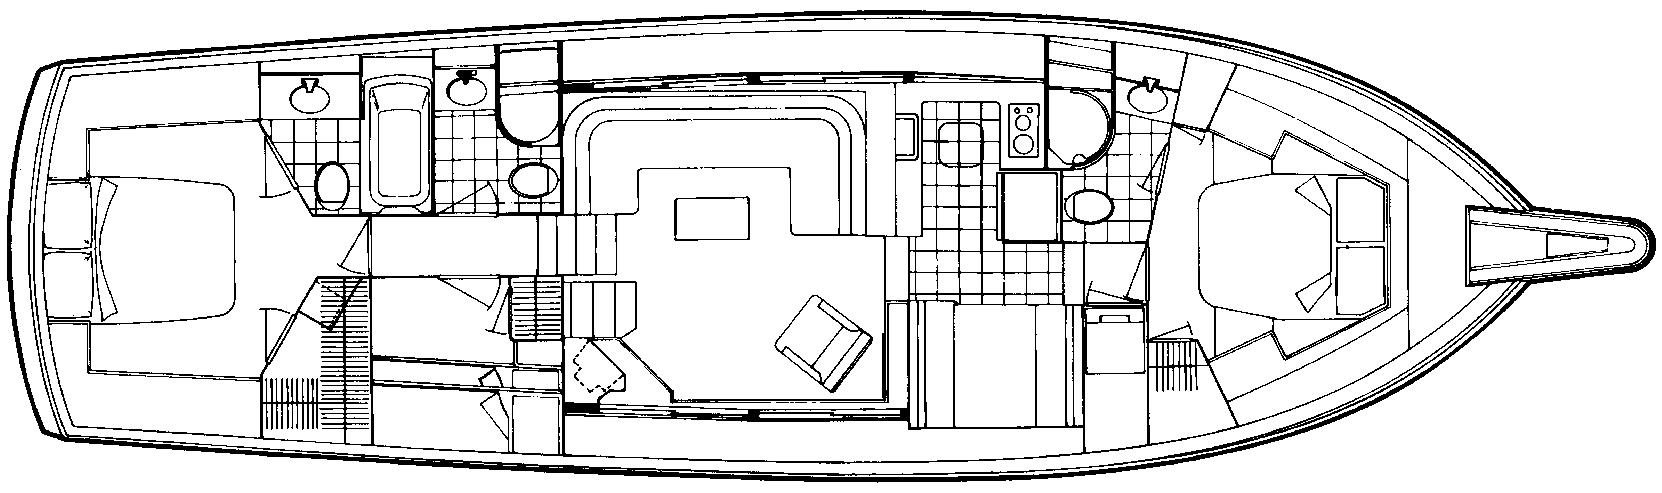 52 Motor Yacht Floor Plan 2